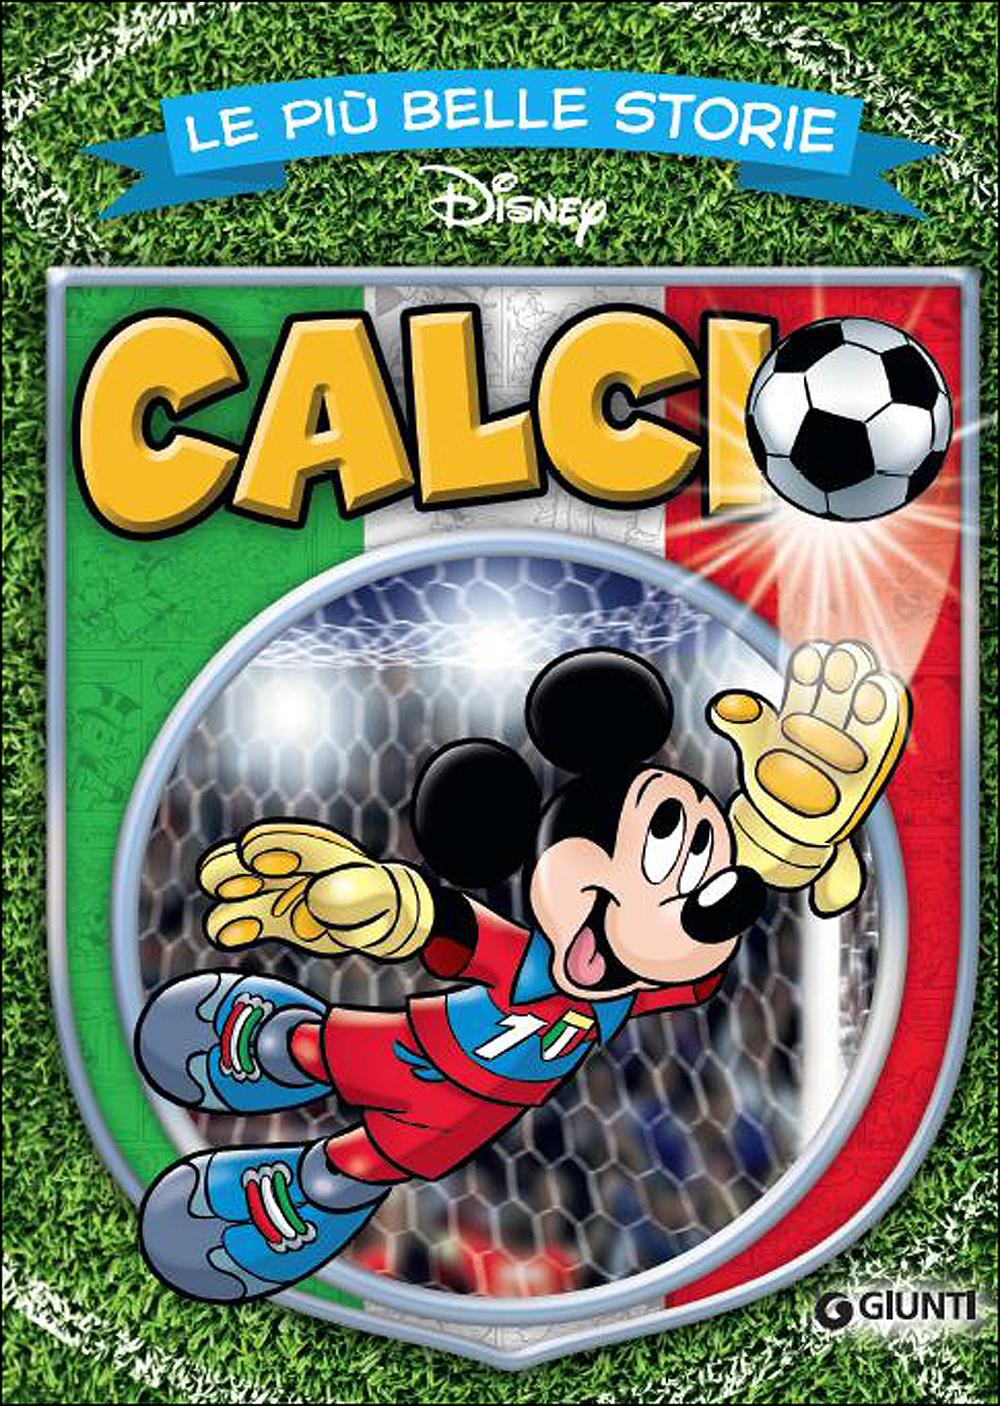 Le più belle storie - Calcio